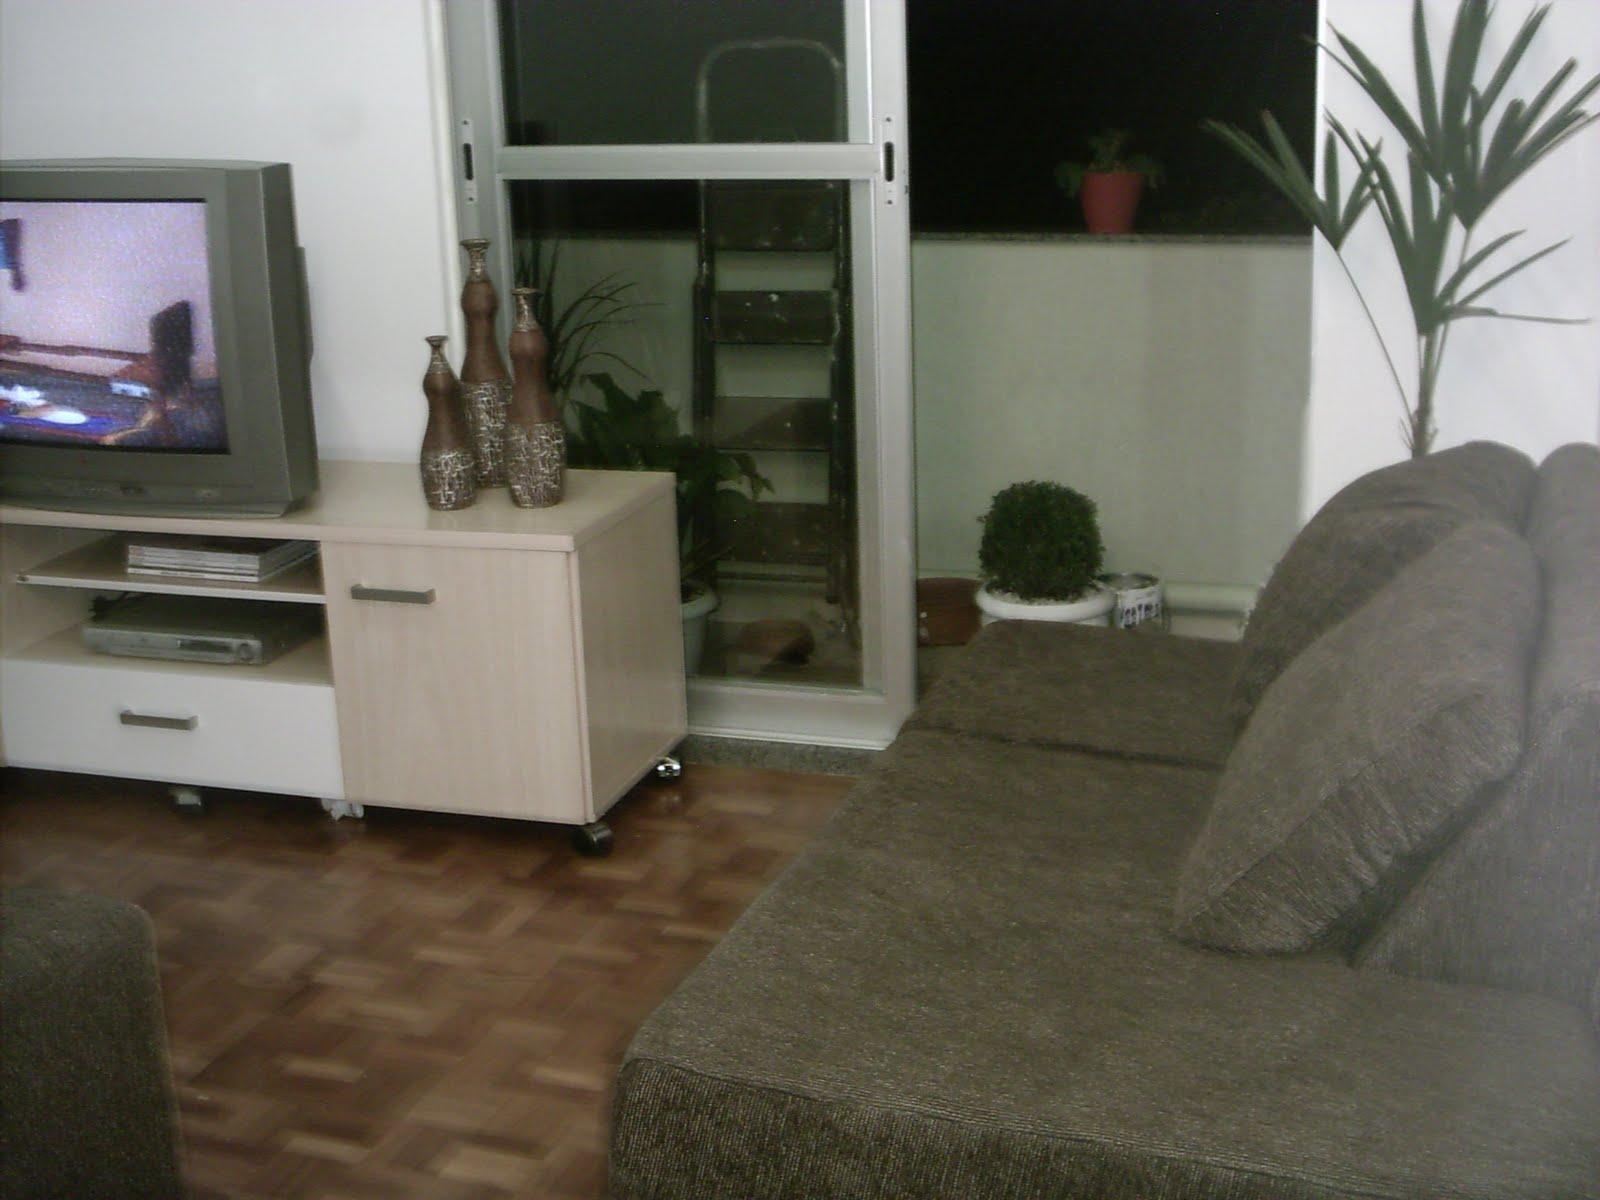 decoracao sofa branco: tapete claro? Reformar o rack e deixá-lo branco? Trocar o assoalho